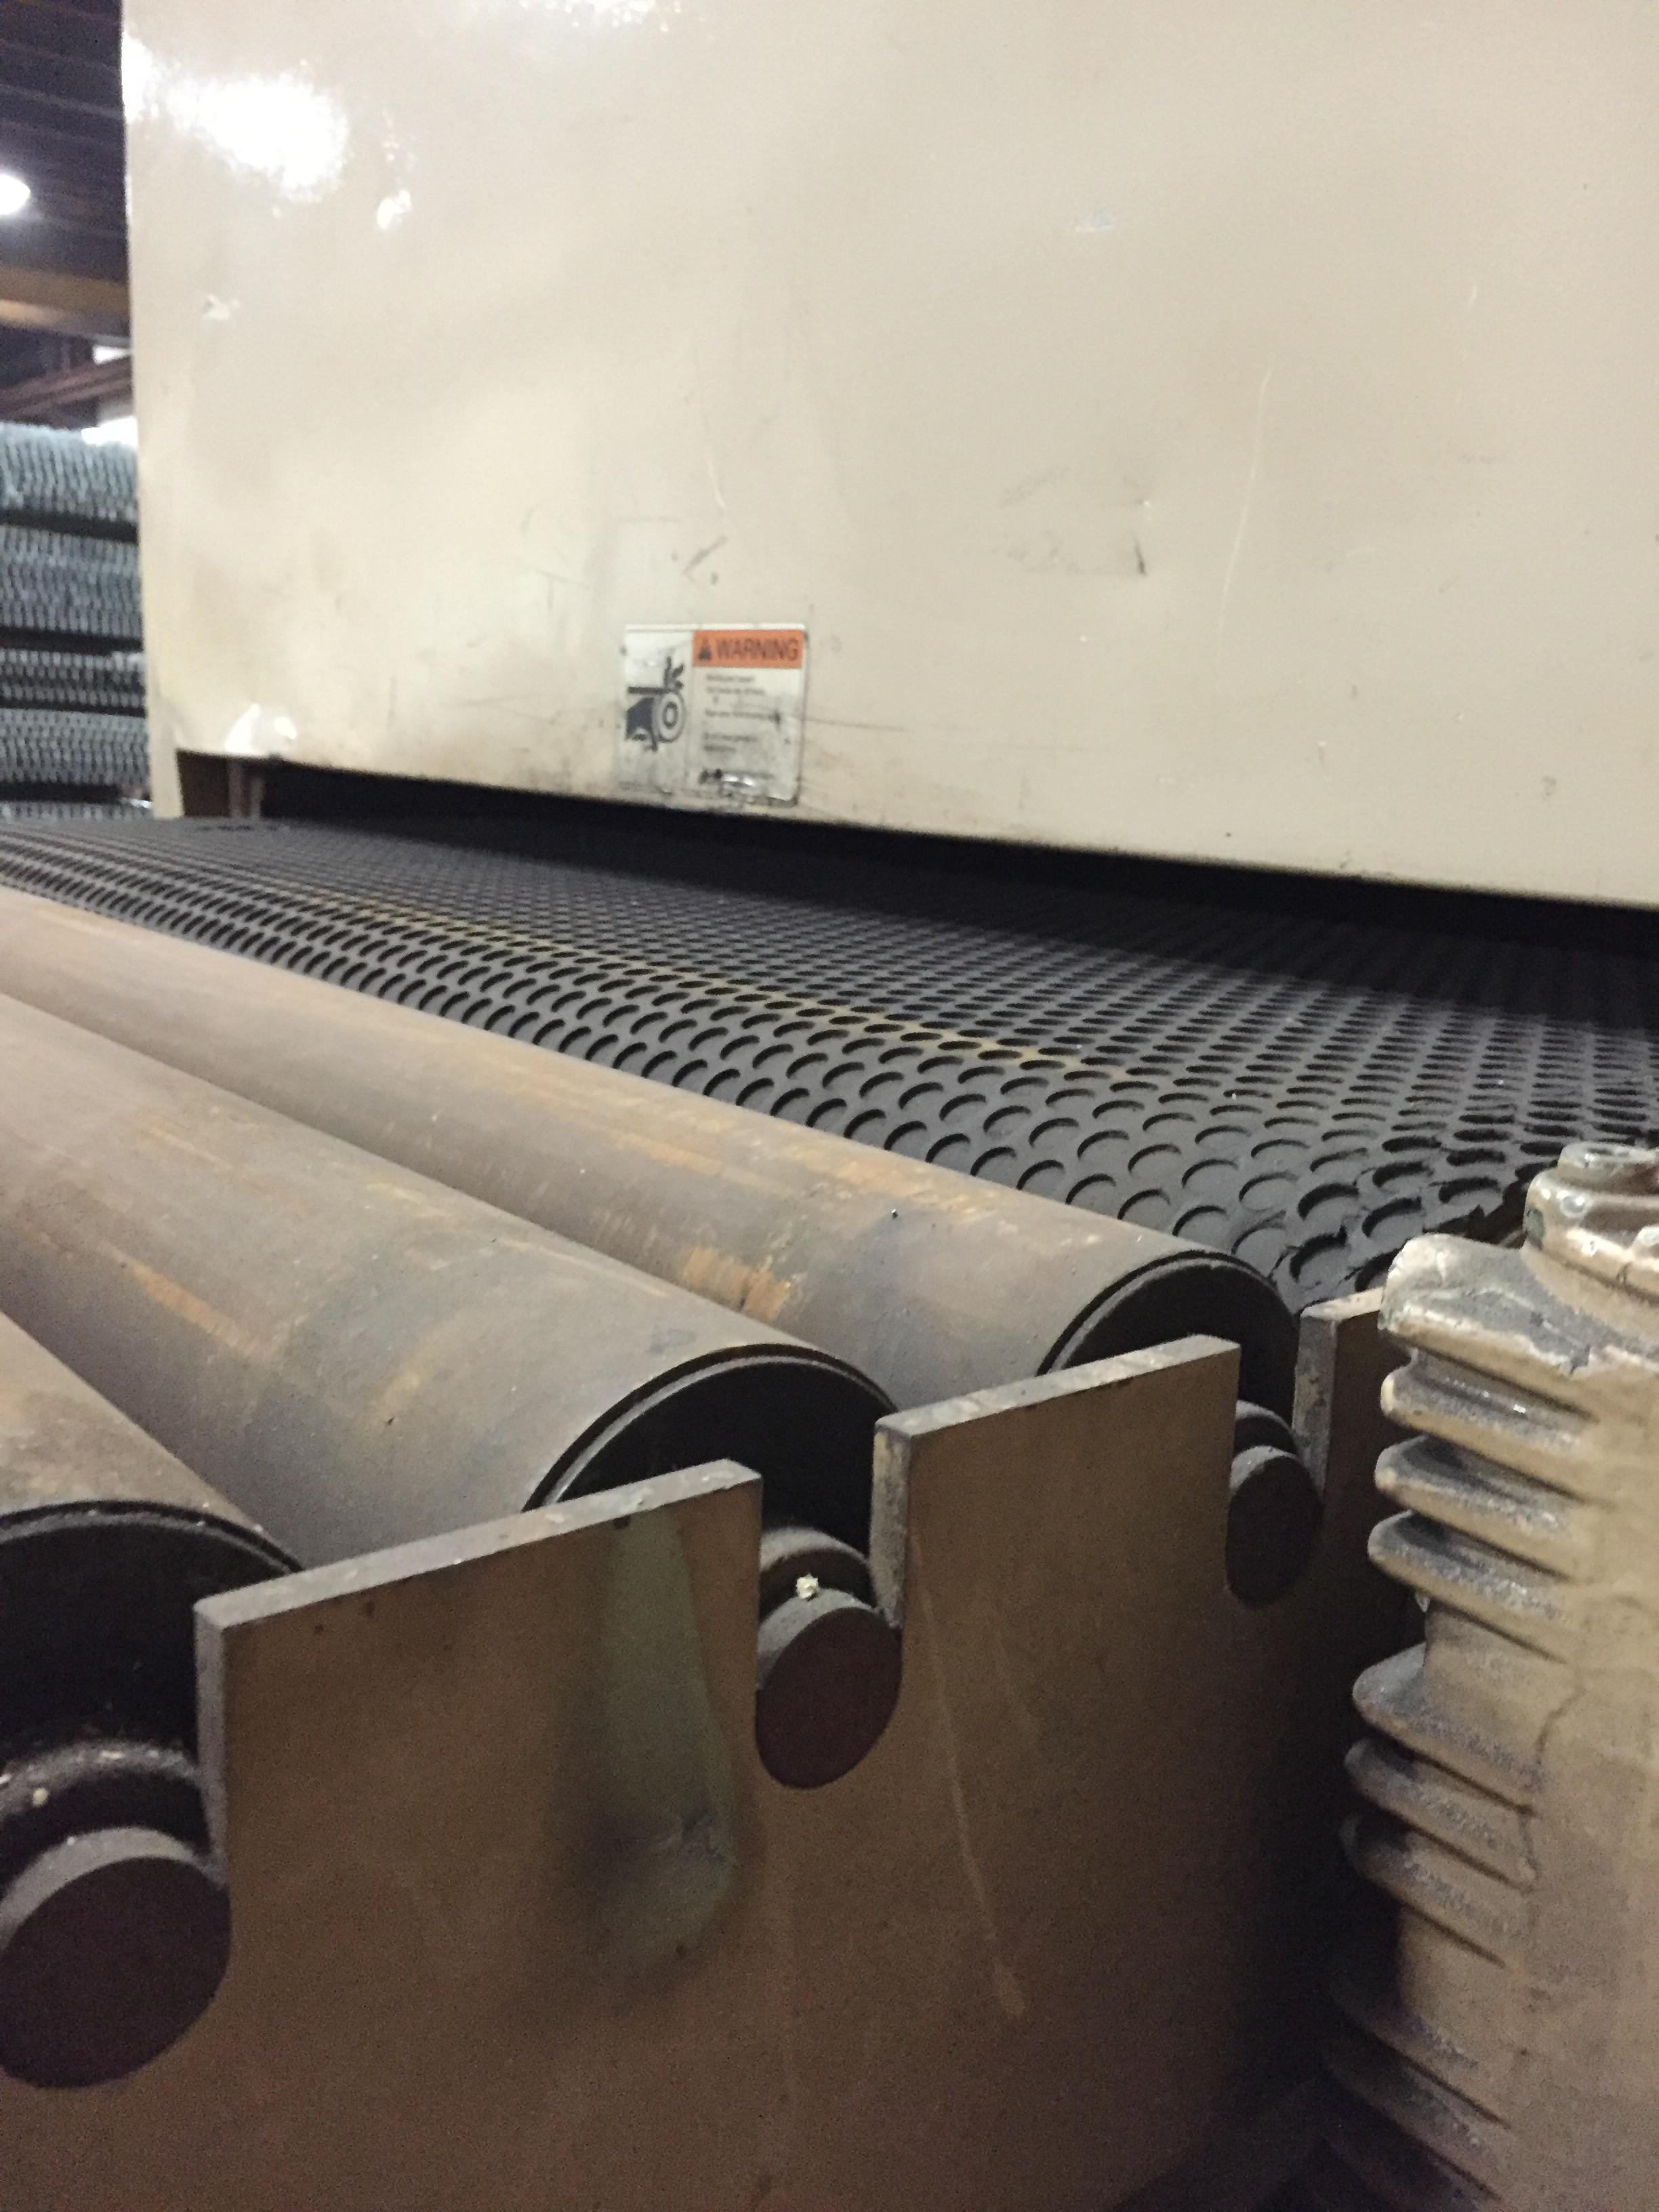 "AEMWEBER AEM TIMESAVER NEW:1996 51"" Abrasive Belt, 53"" Conveyor Belt, 15FPM, 40HP"